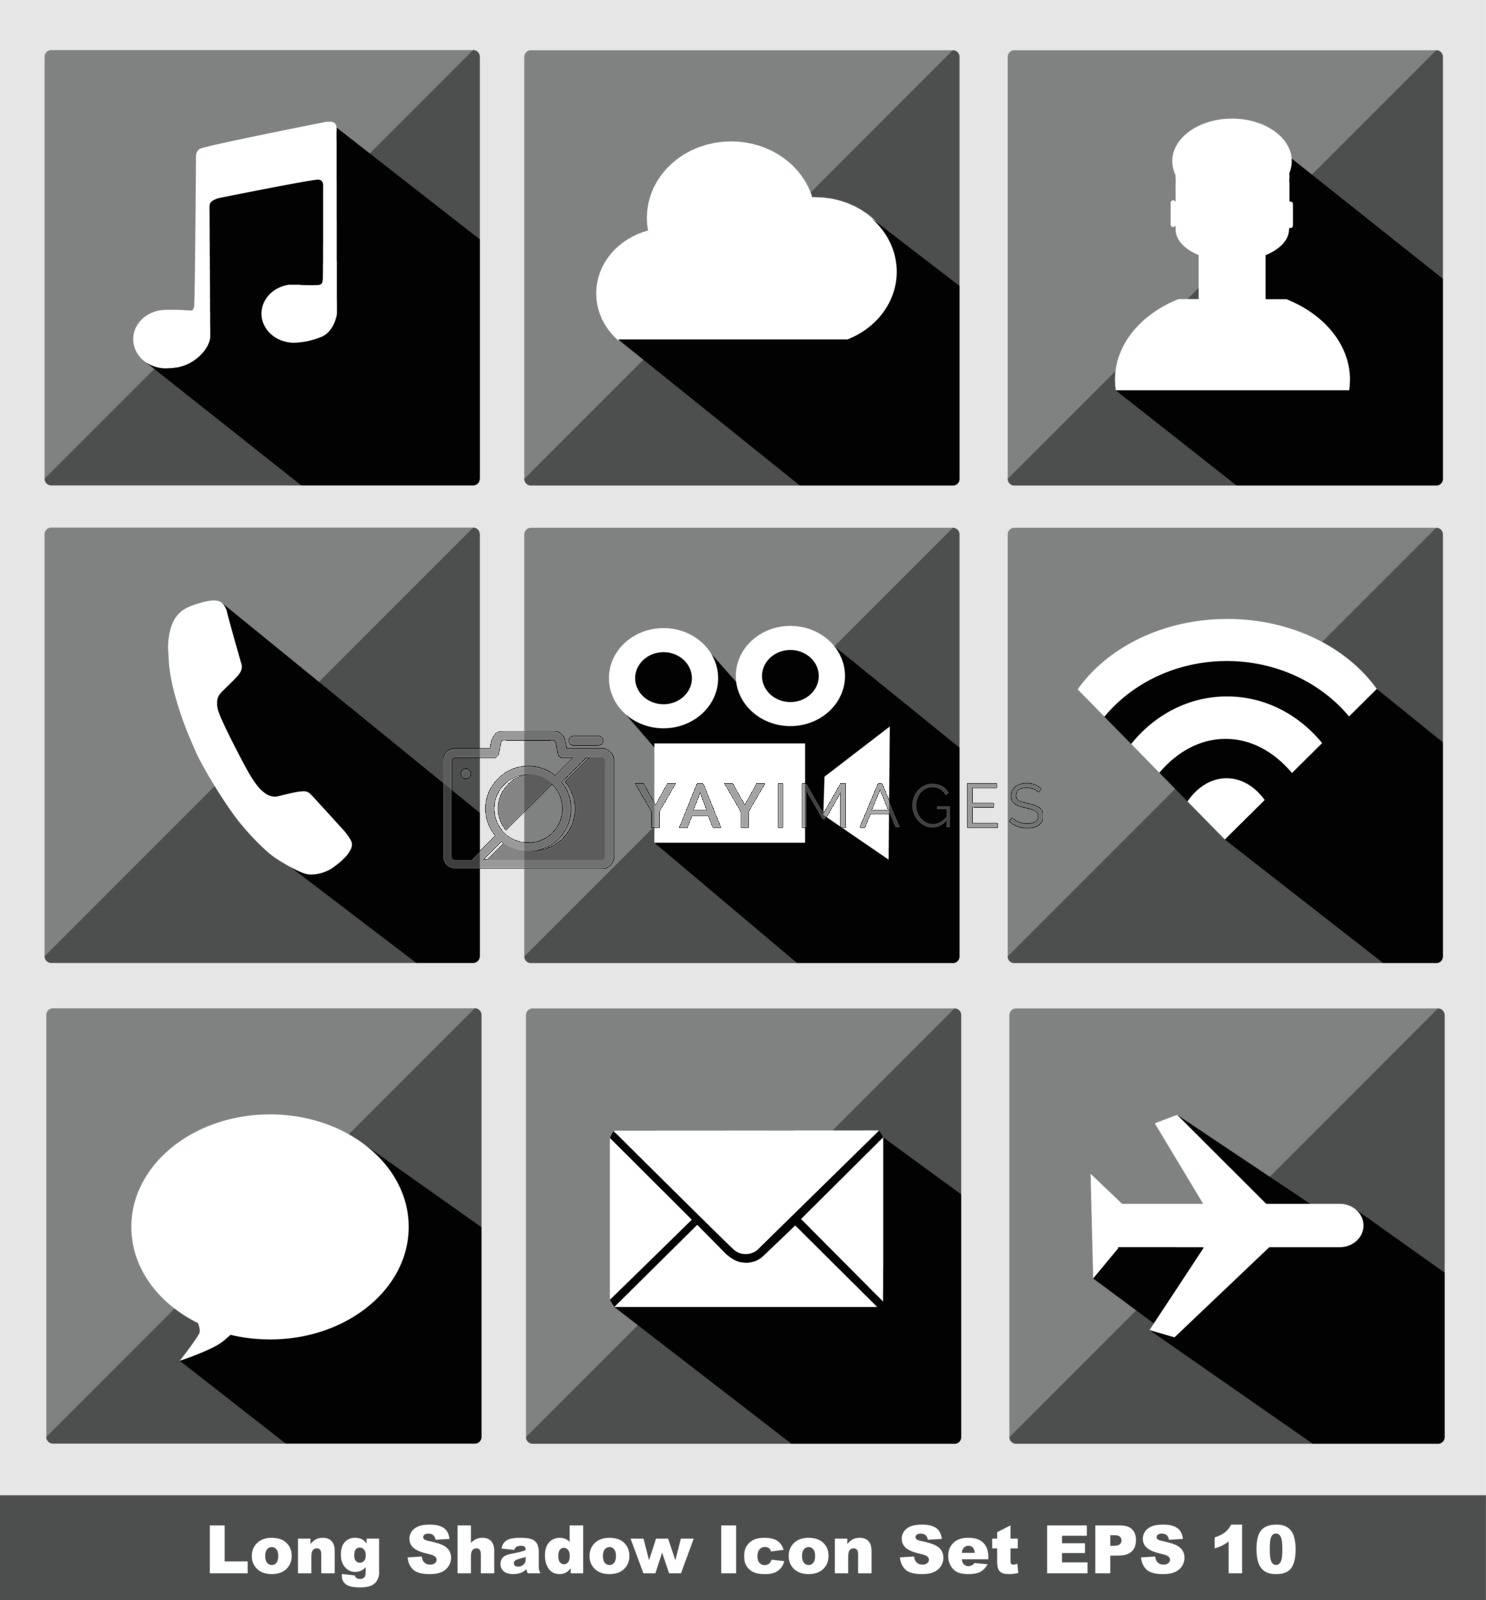 Communication long shadow icon set eps 10